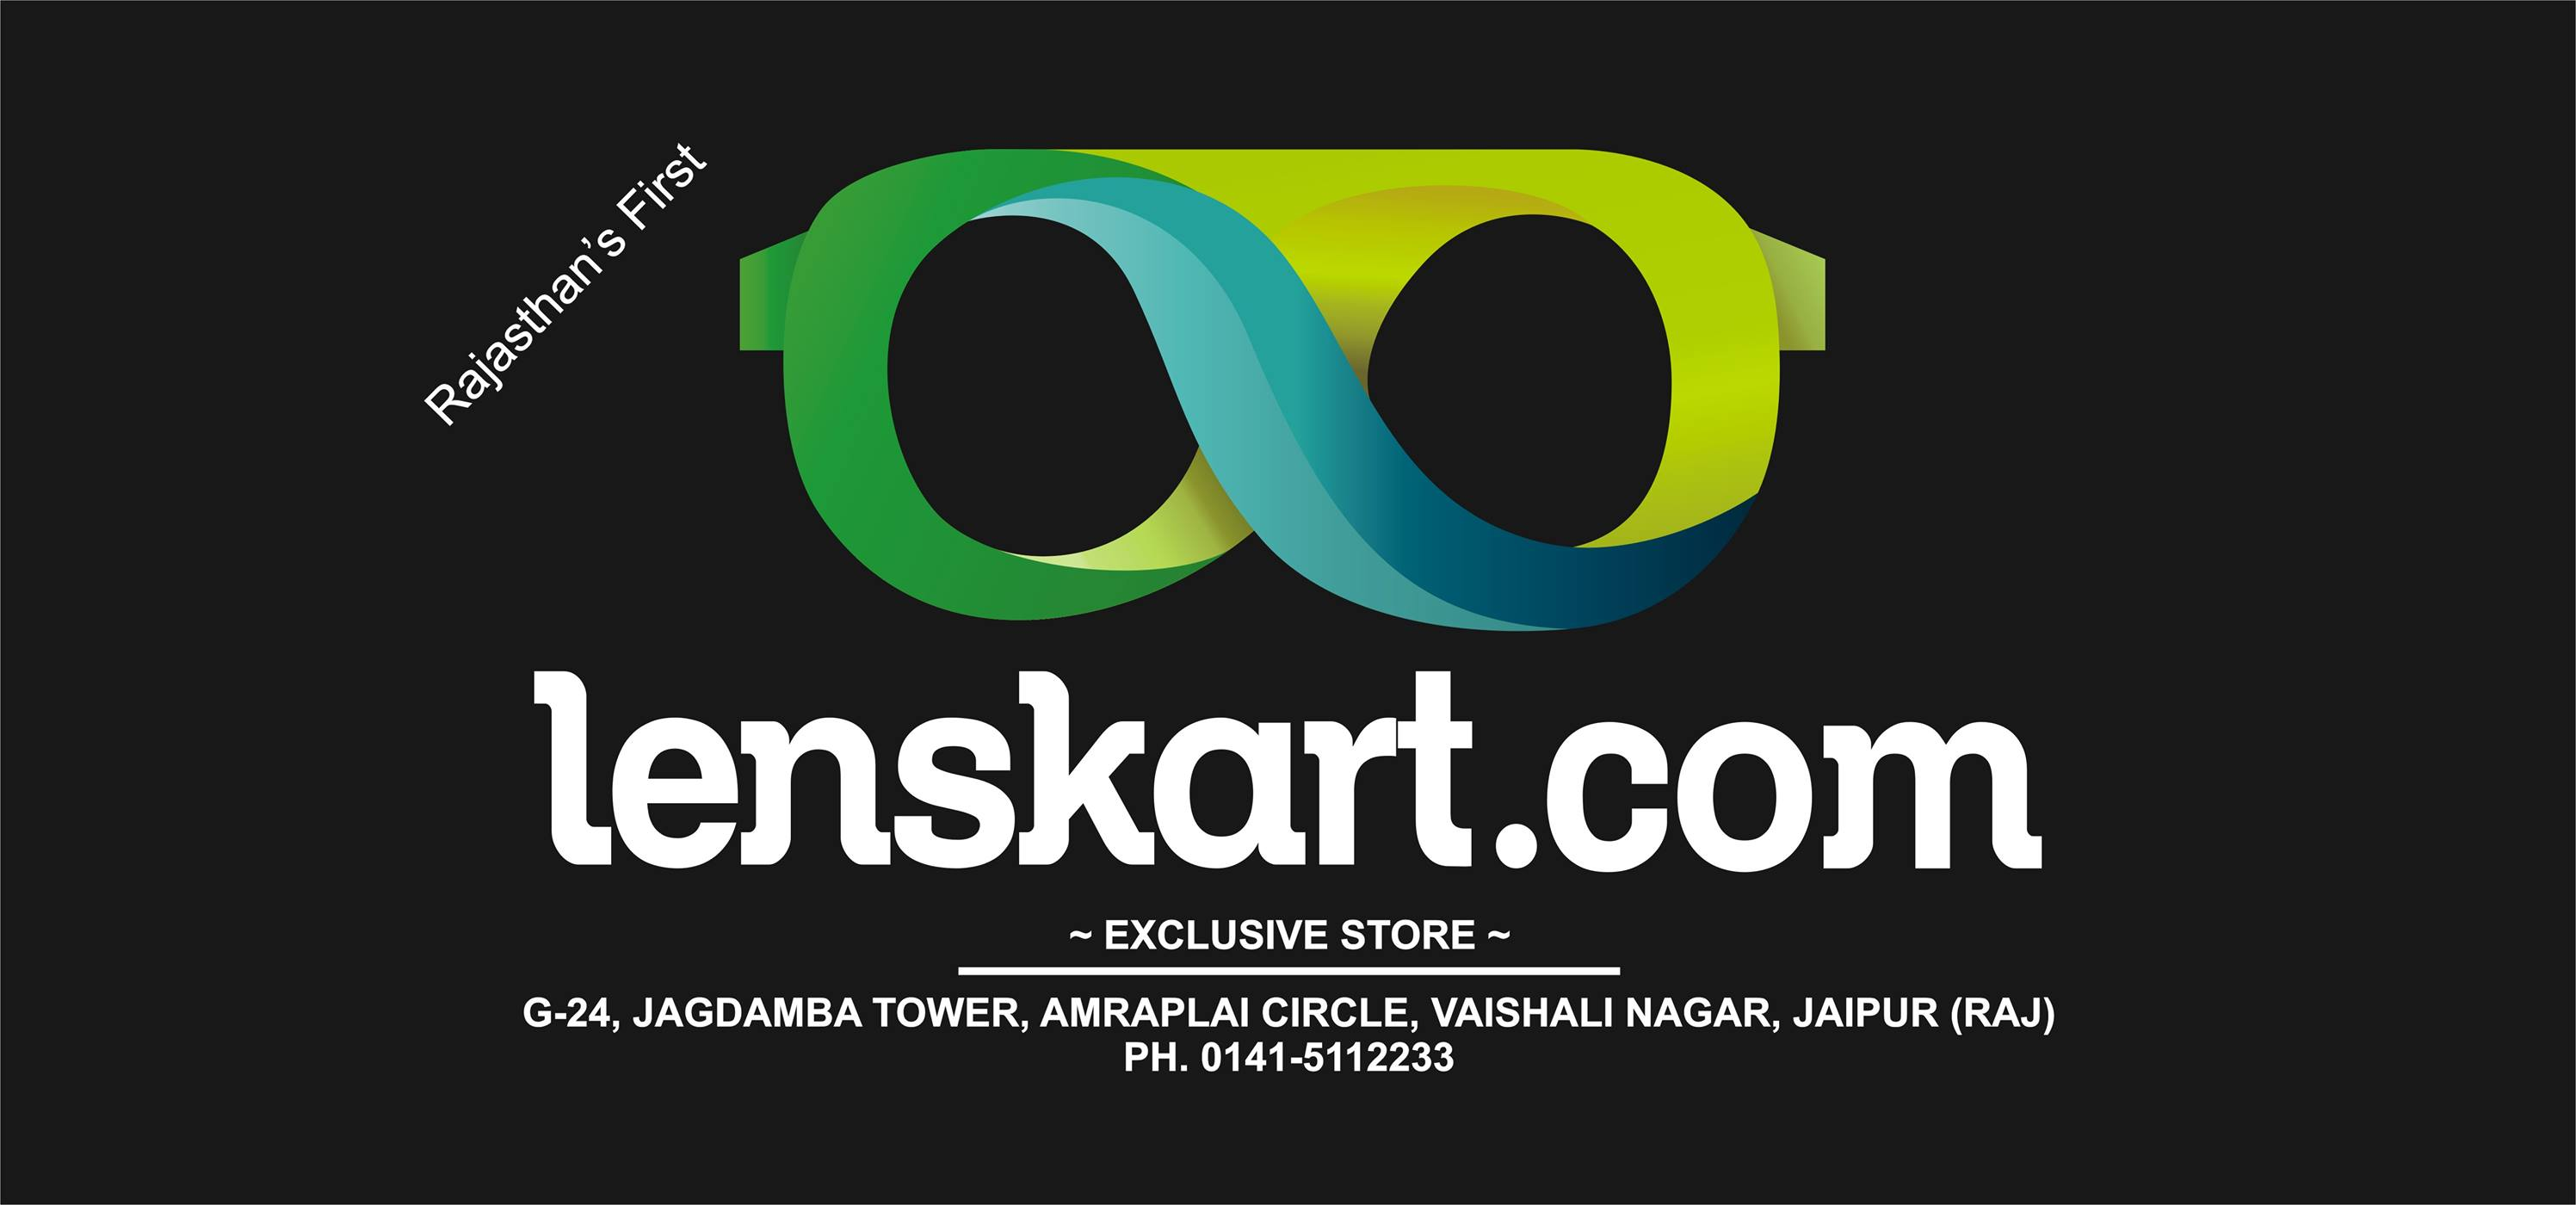 First Lenskart Store in Rajastan